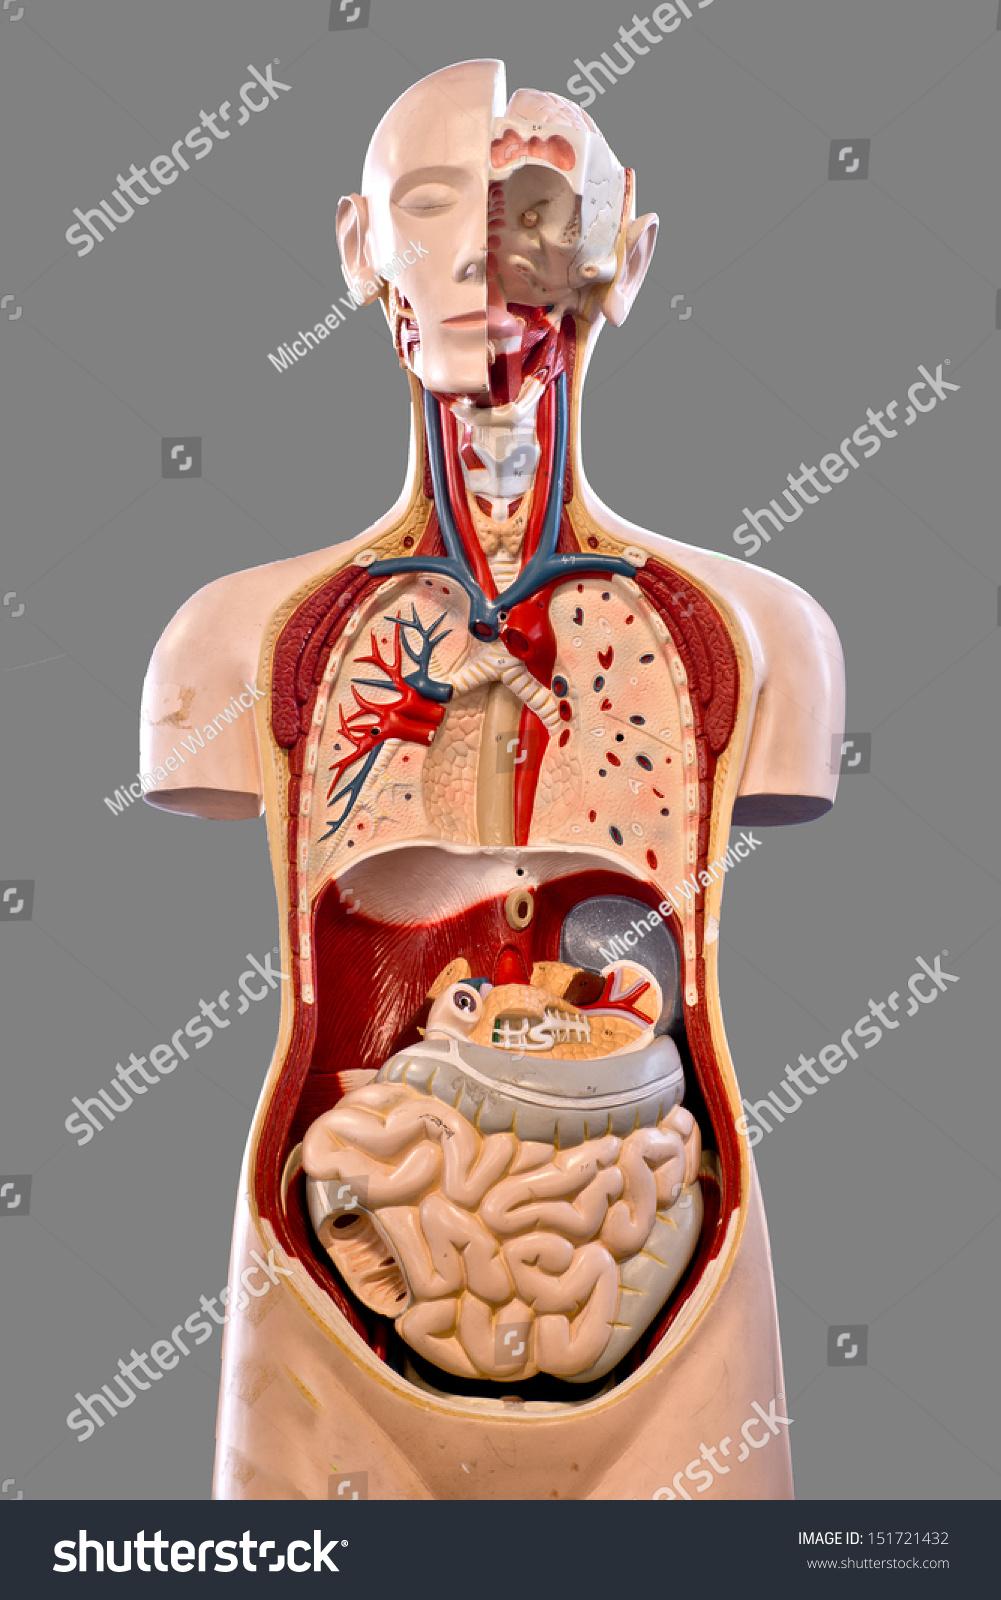 Human Anatomy Doll Model Stock Photo Image Royalty Free